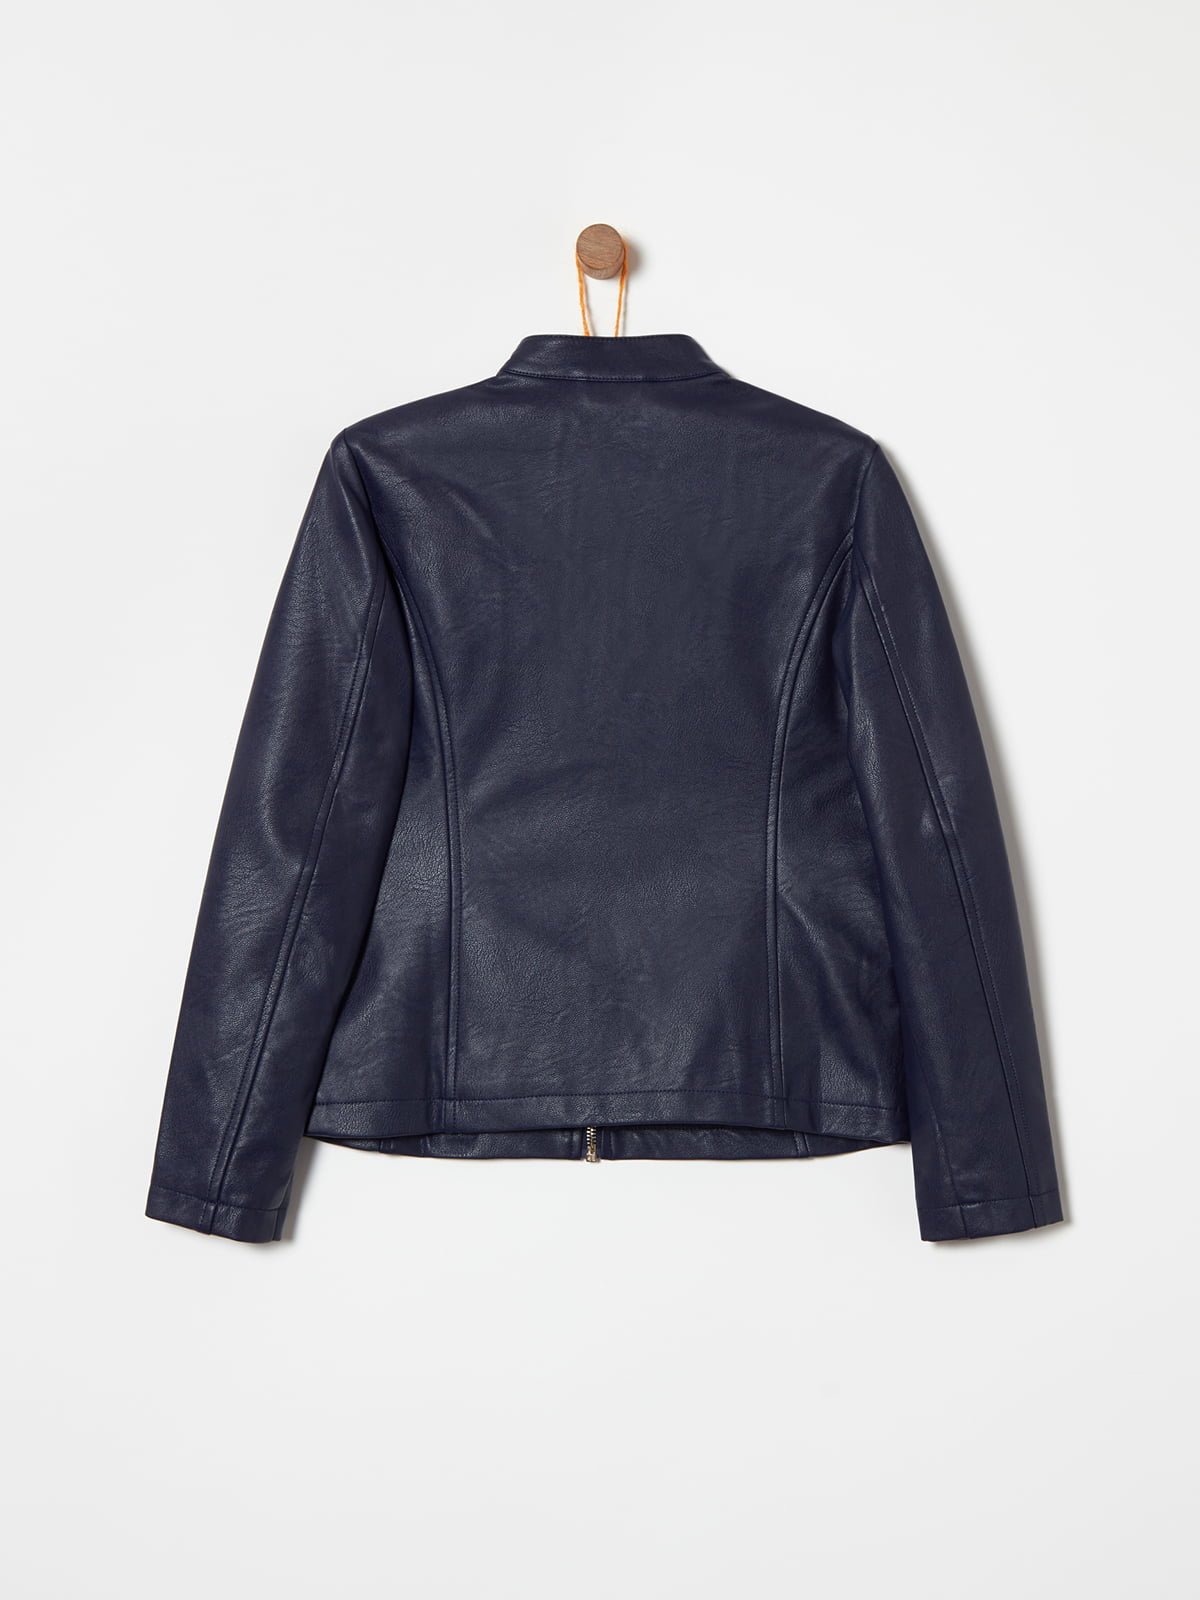 Куртка темно-синяя | 4865340 | фото 2